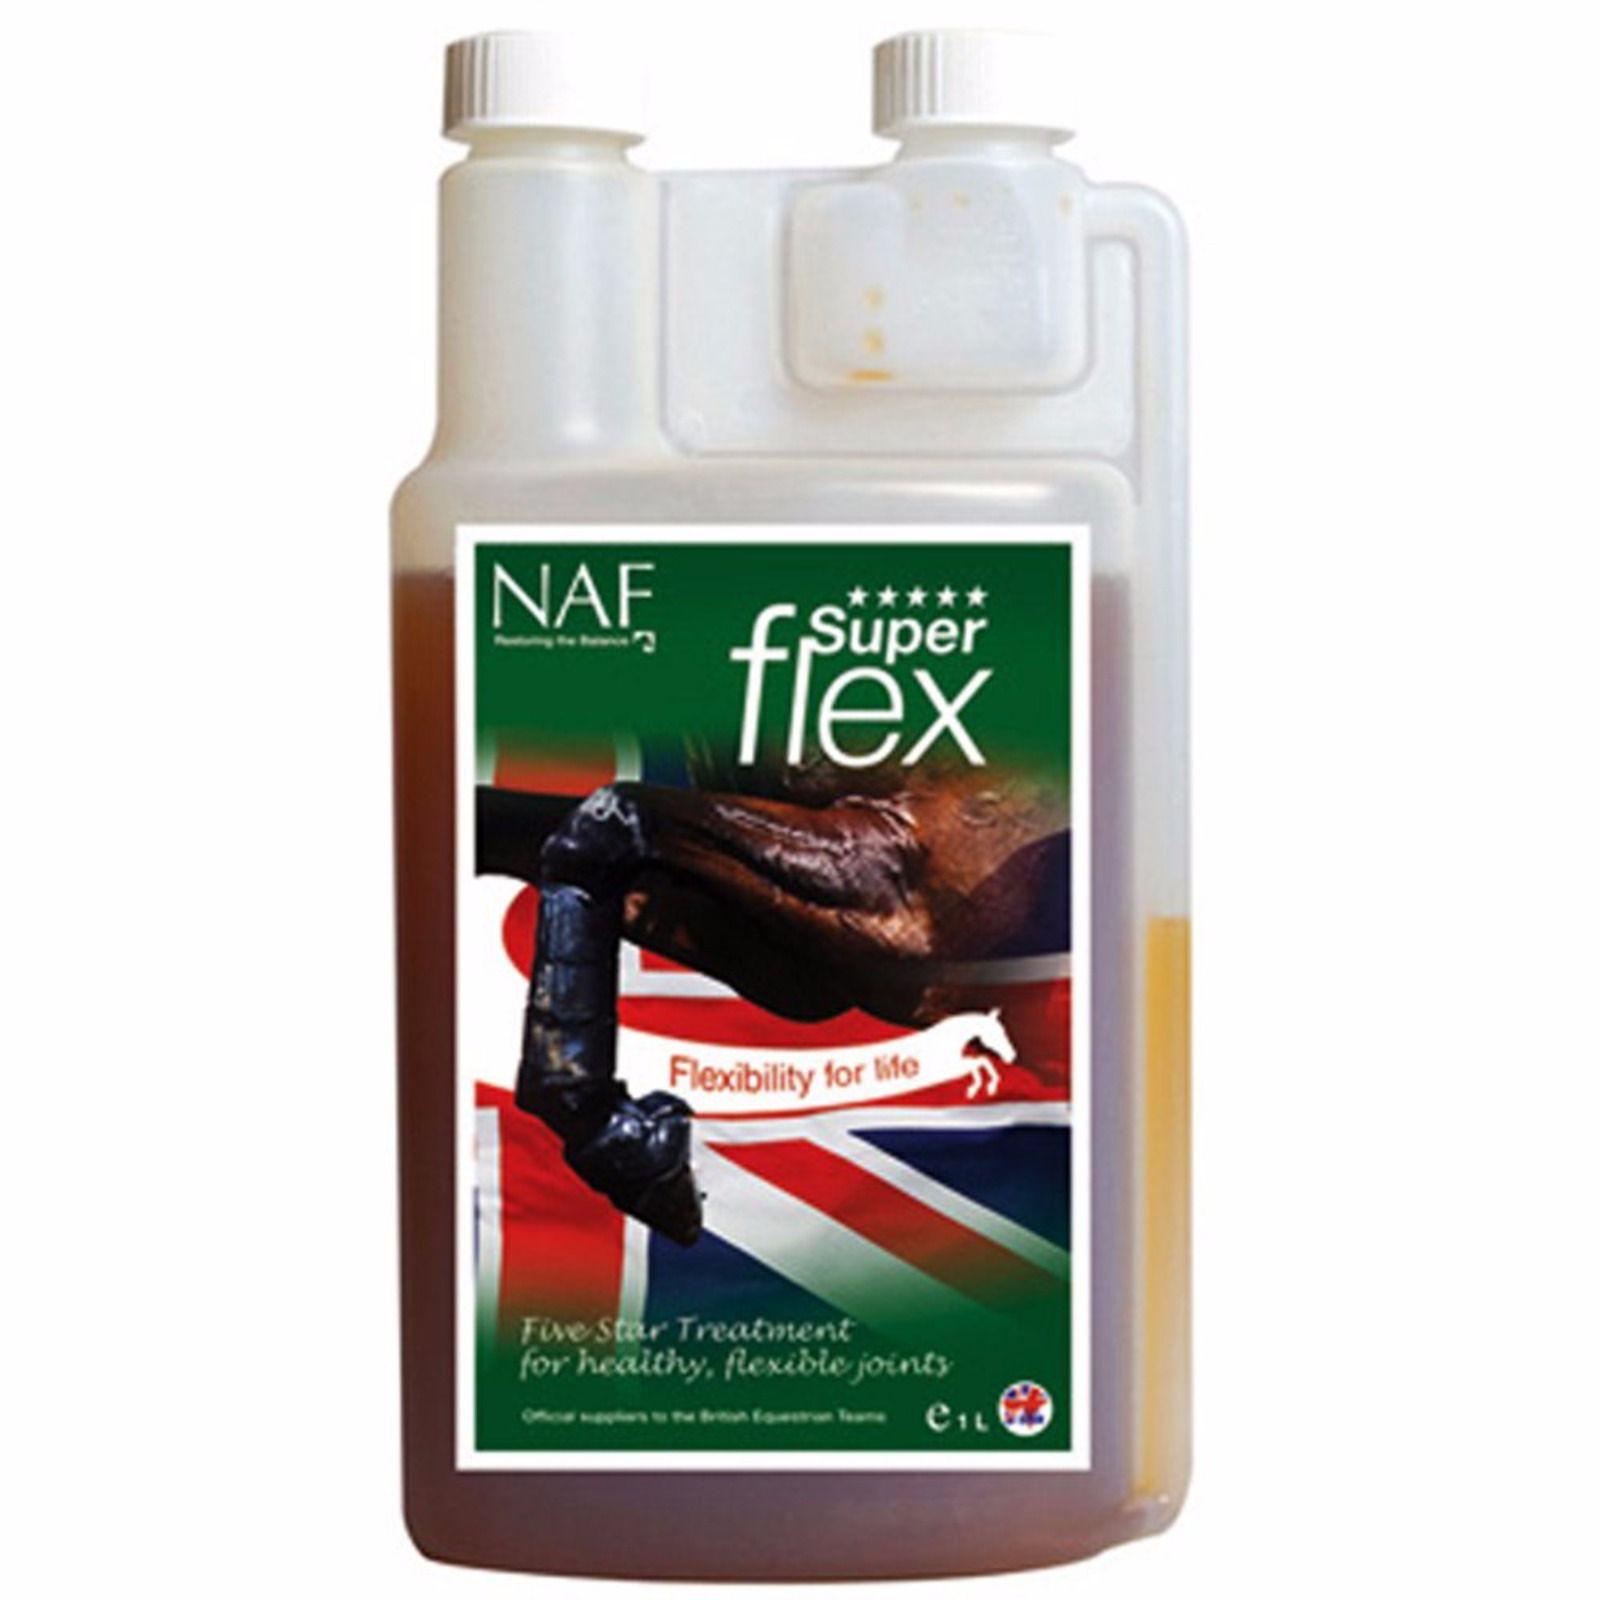 NAF 5 Star Superflex Liquid 1 Ltr